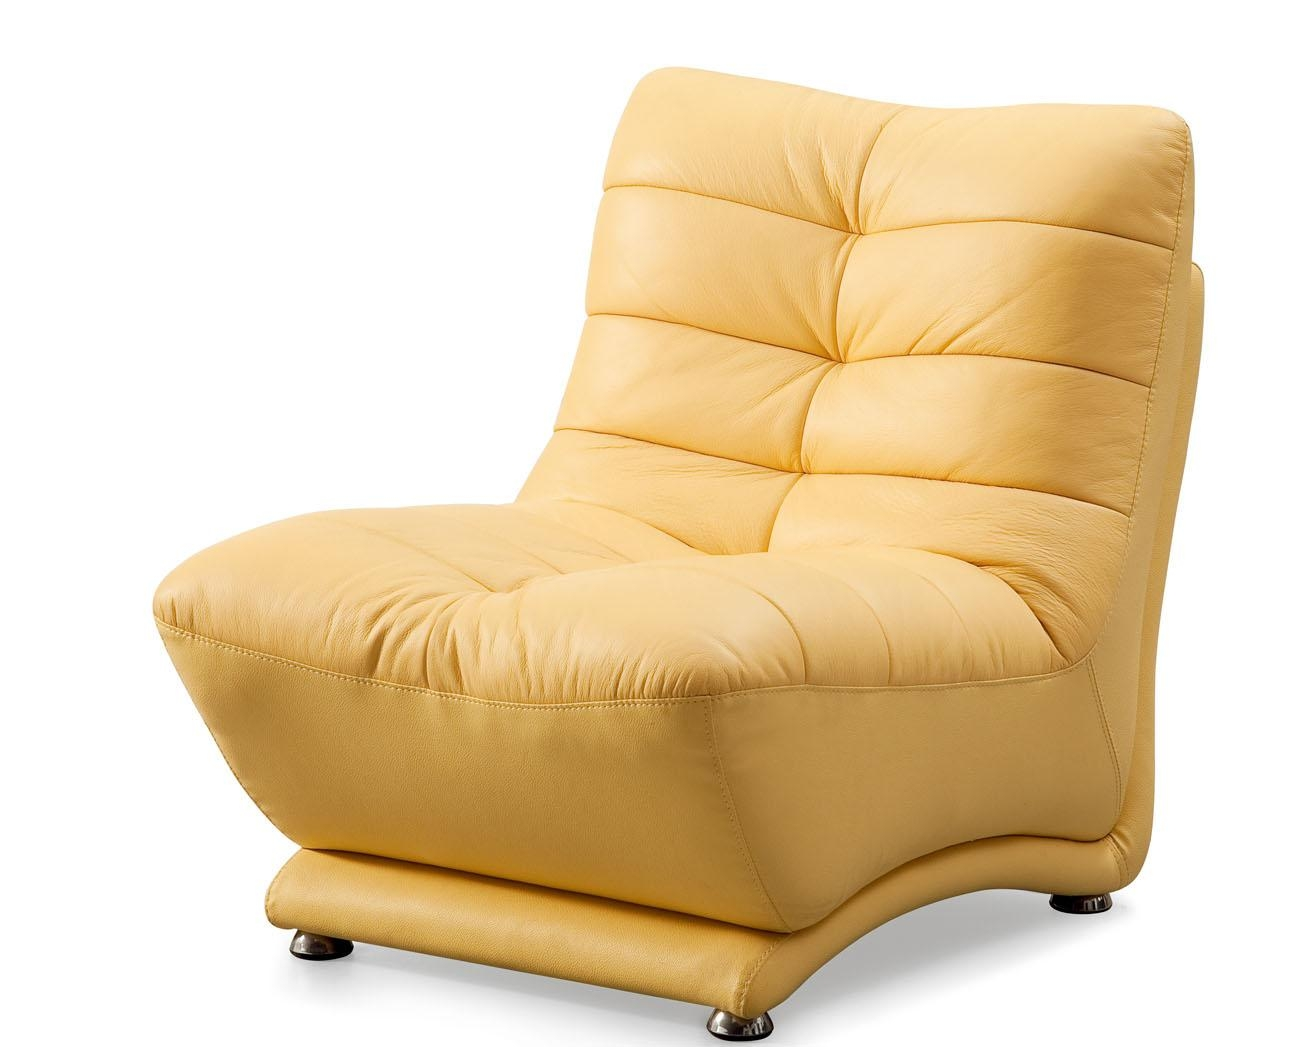 Furniture Home : Sofa Chairs Furniture Designs (30) Modern Elegant Inside Sofa Chairs (Image 7 of 20)